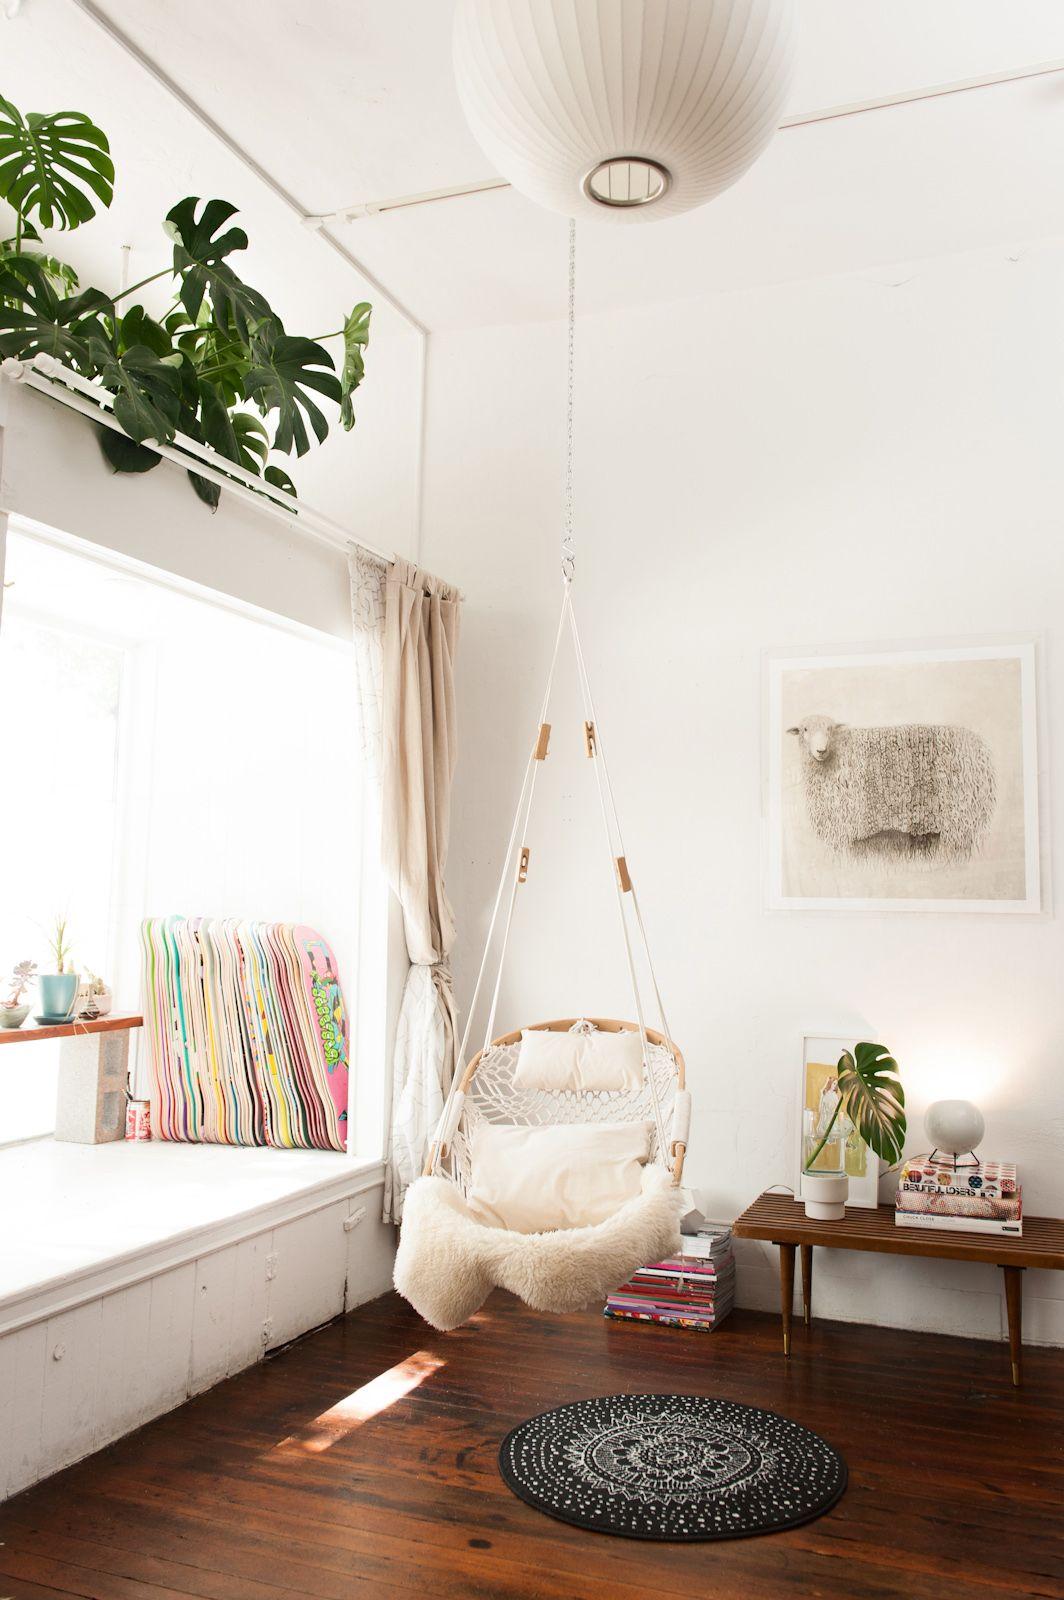 Angela tafoya small apartment decor tips san francisco apartment